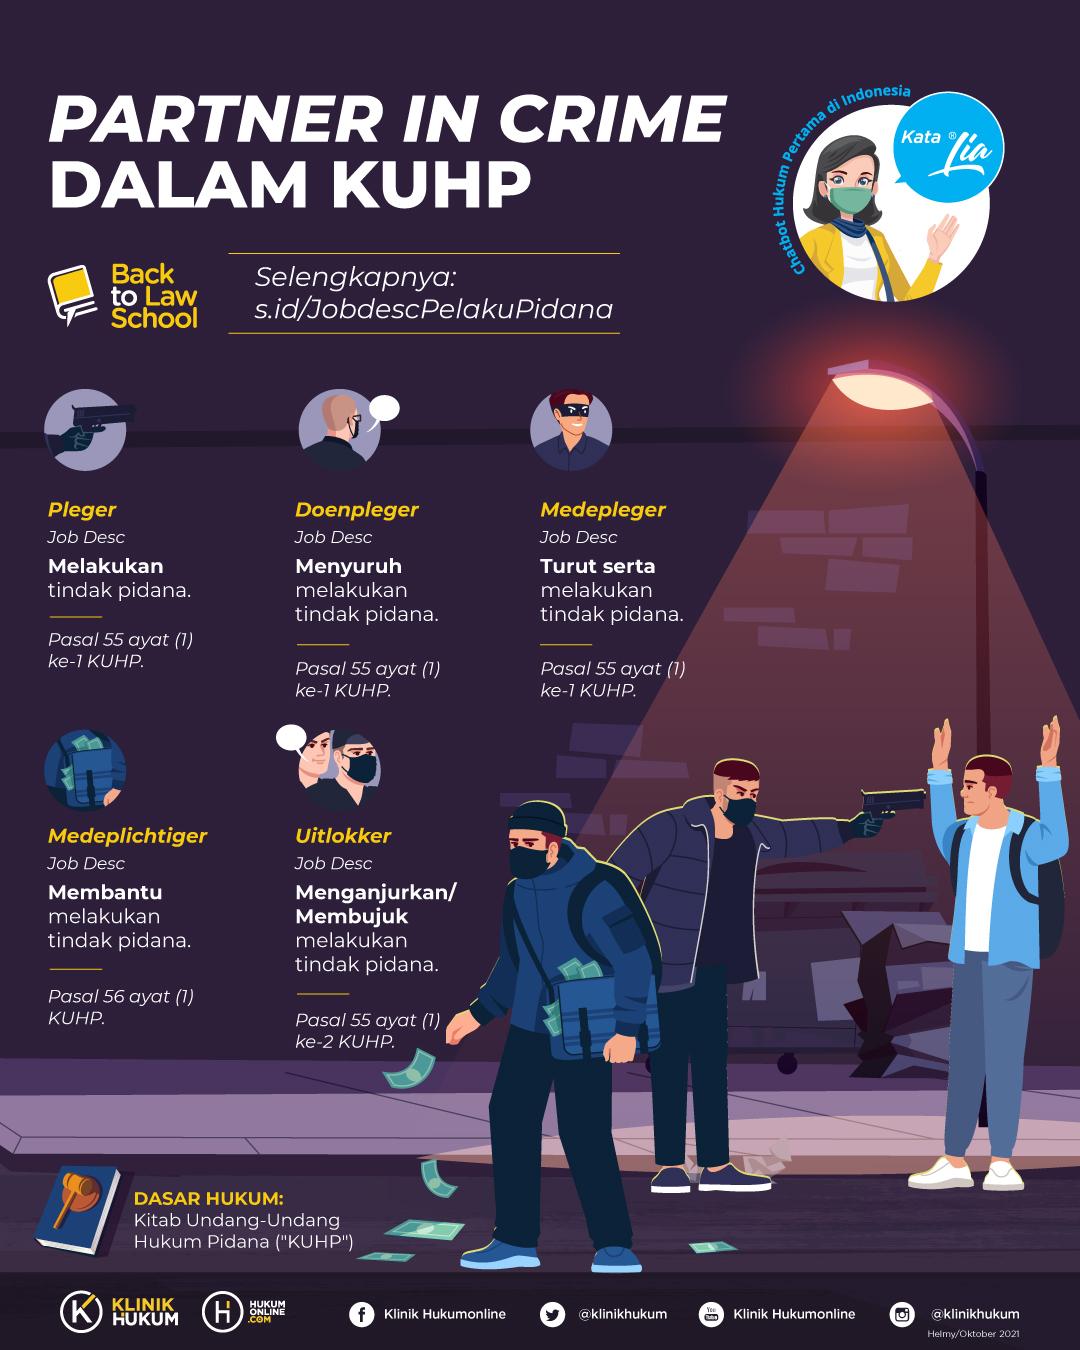 <I>Partner in Crime</i> dalam KUHP